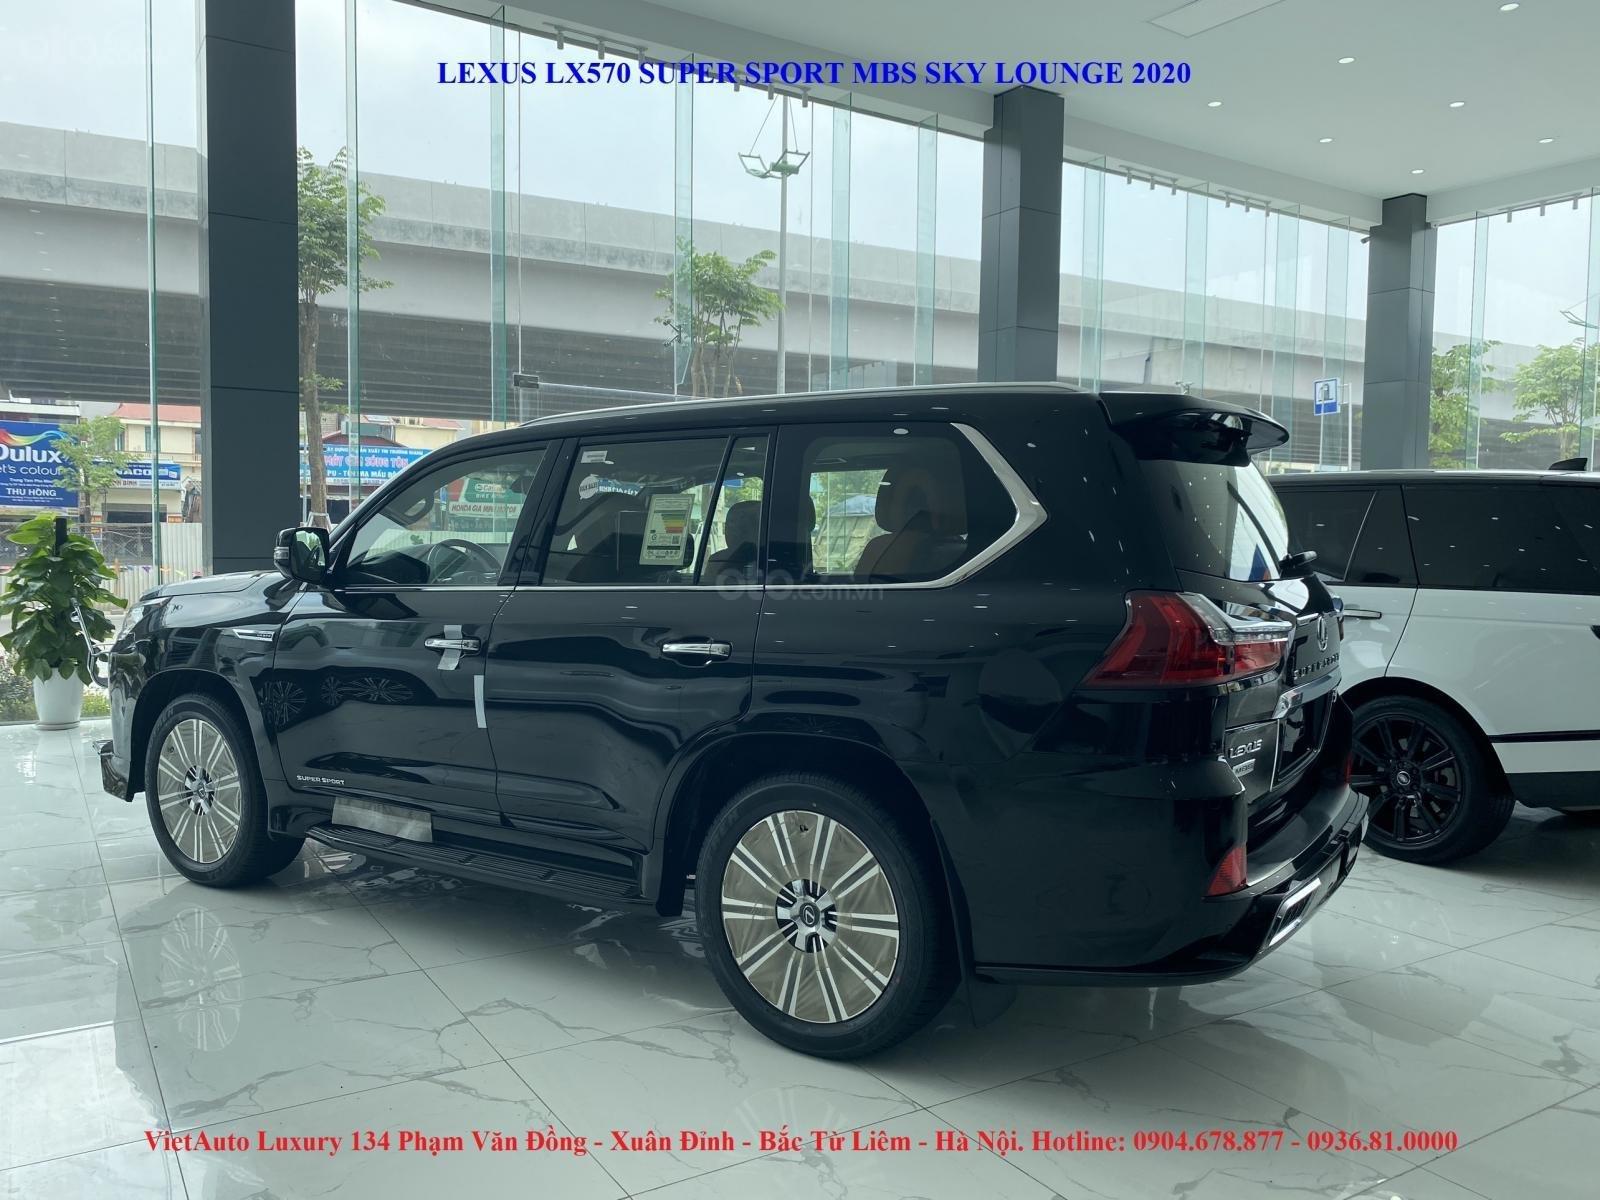 Bán Lexus LX570 Super Sport MBS bản 04 chỗ ngồi, sản xuất 2020 (14)